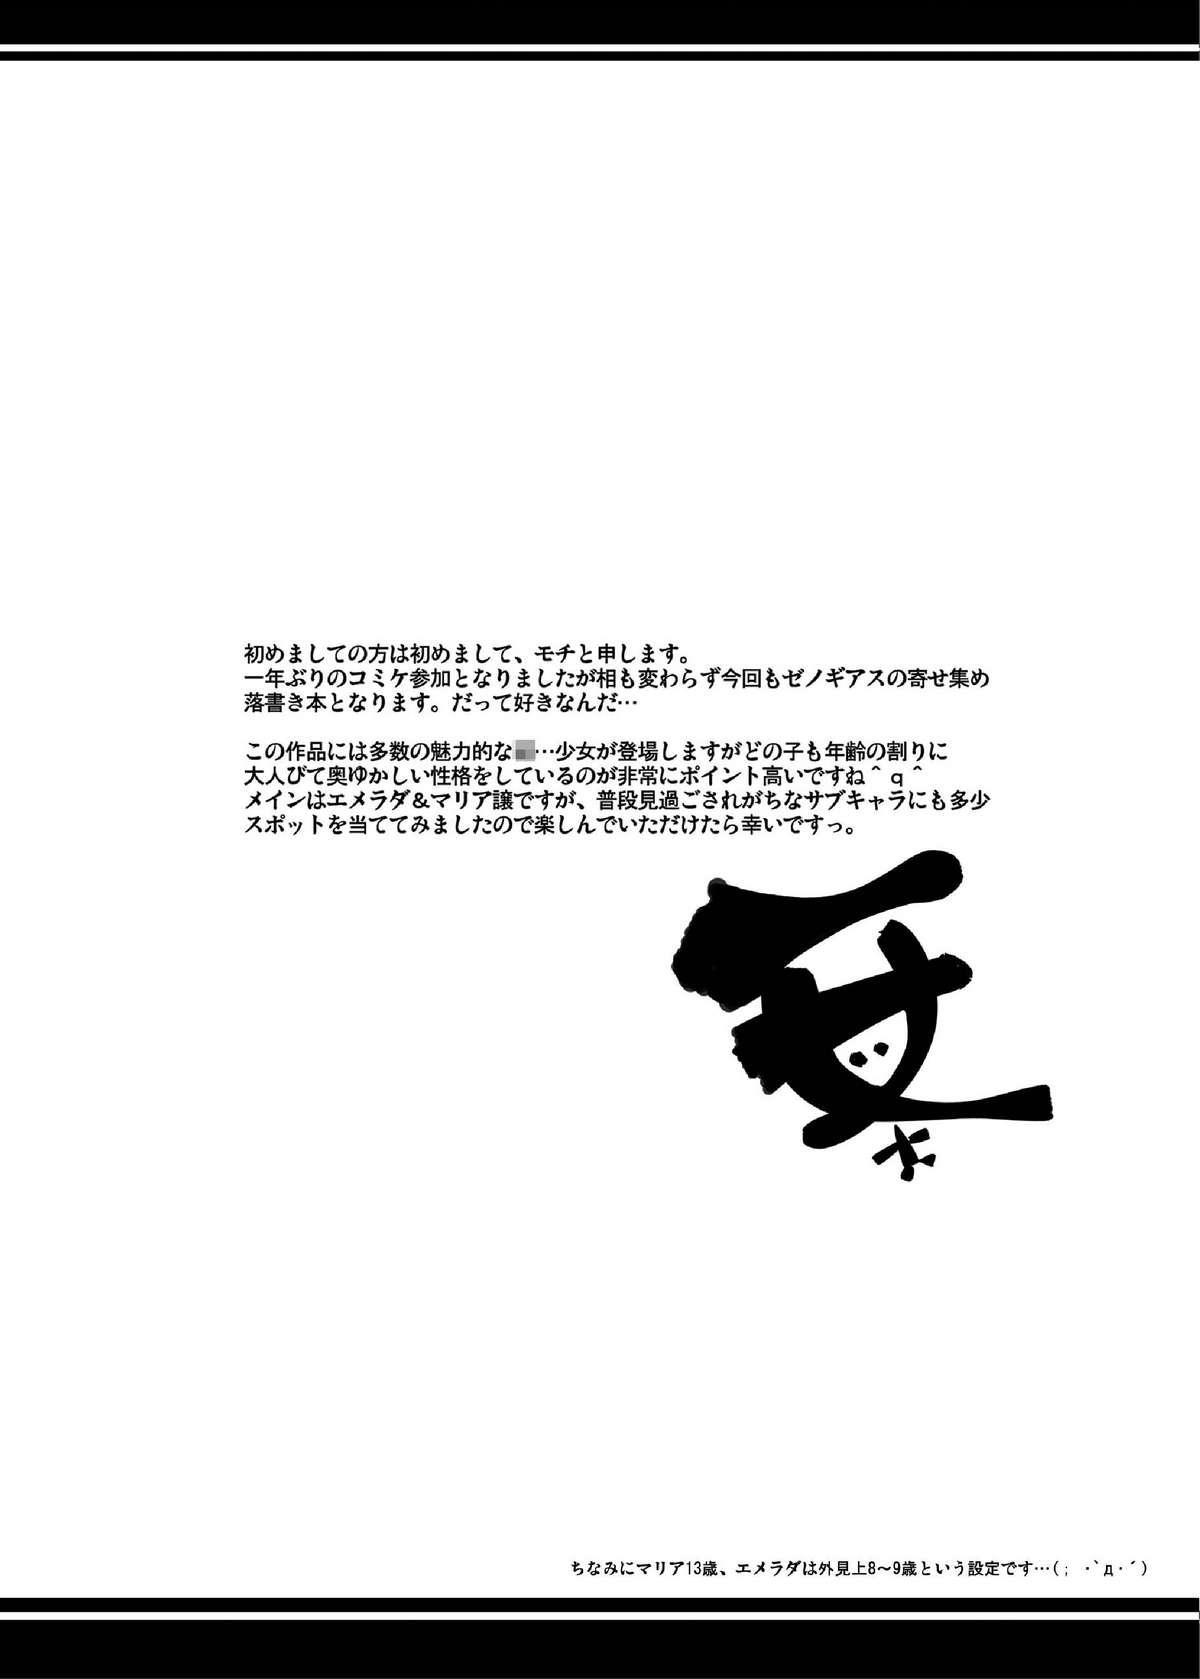 Xenogears no Eroi Rakugaki Hon part3 1